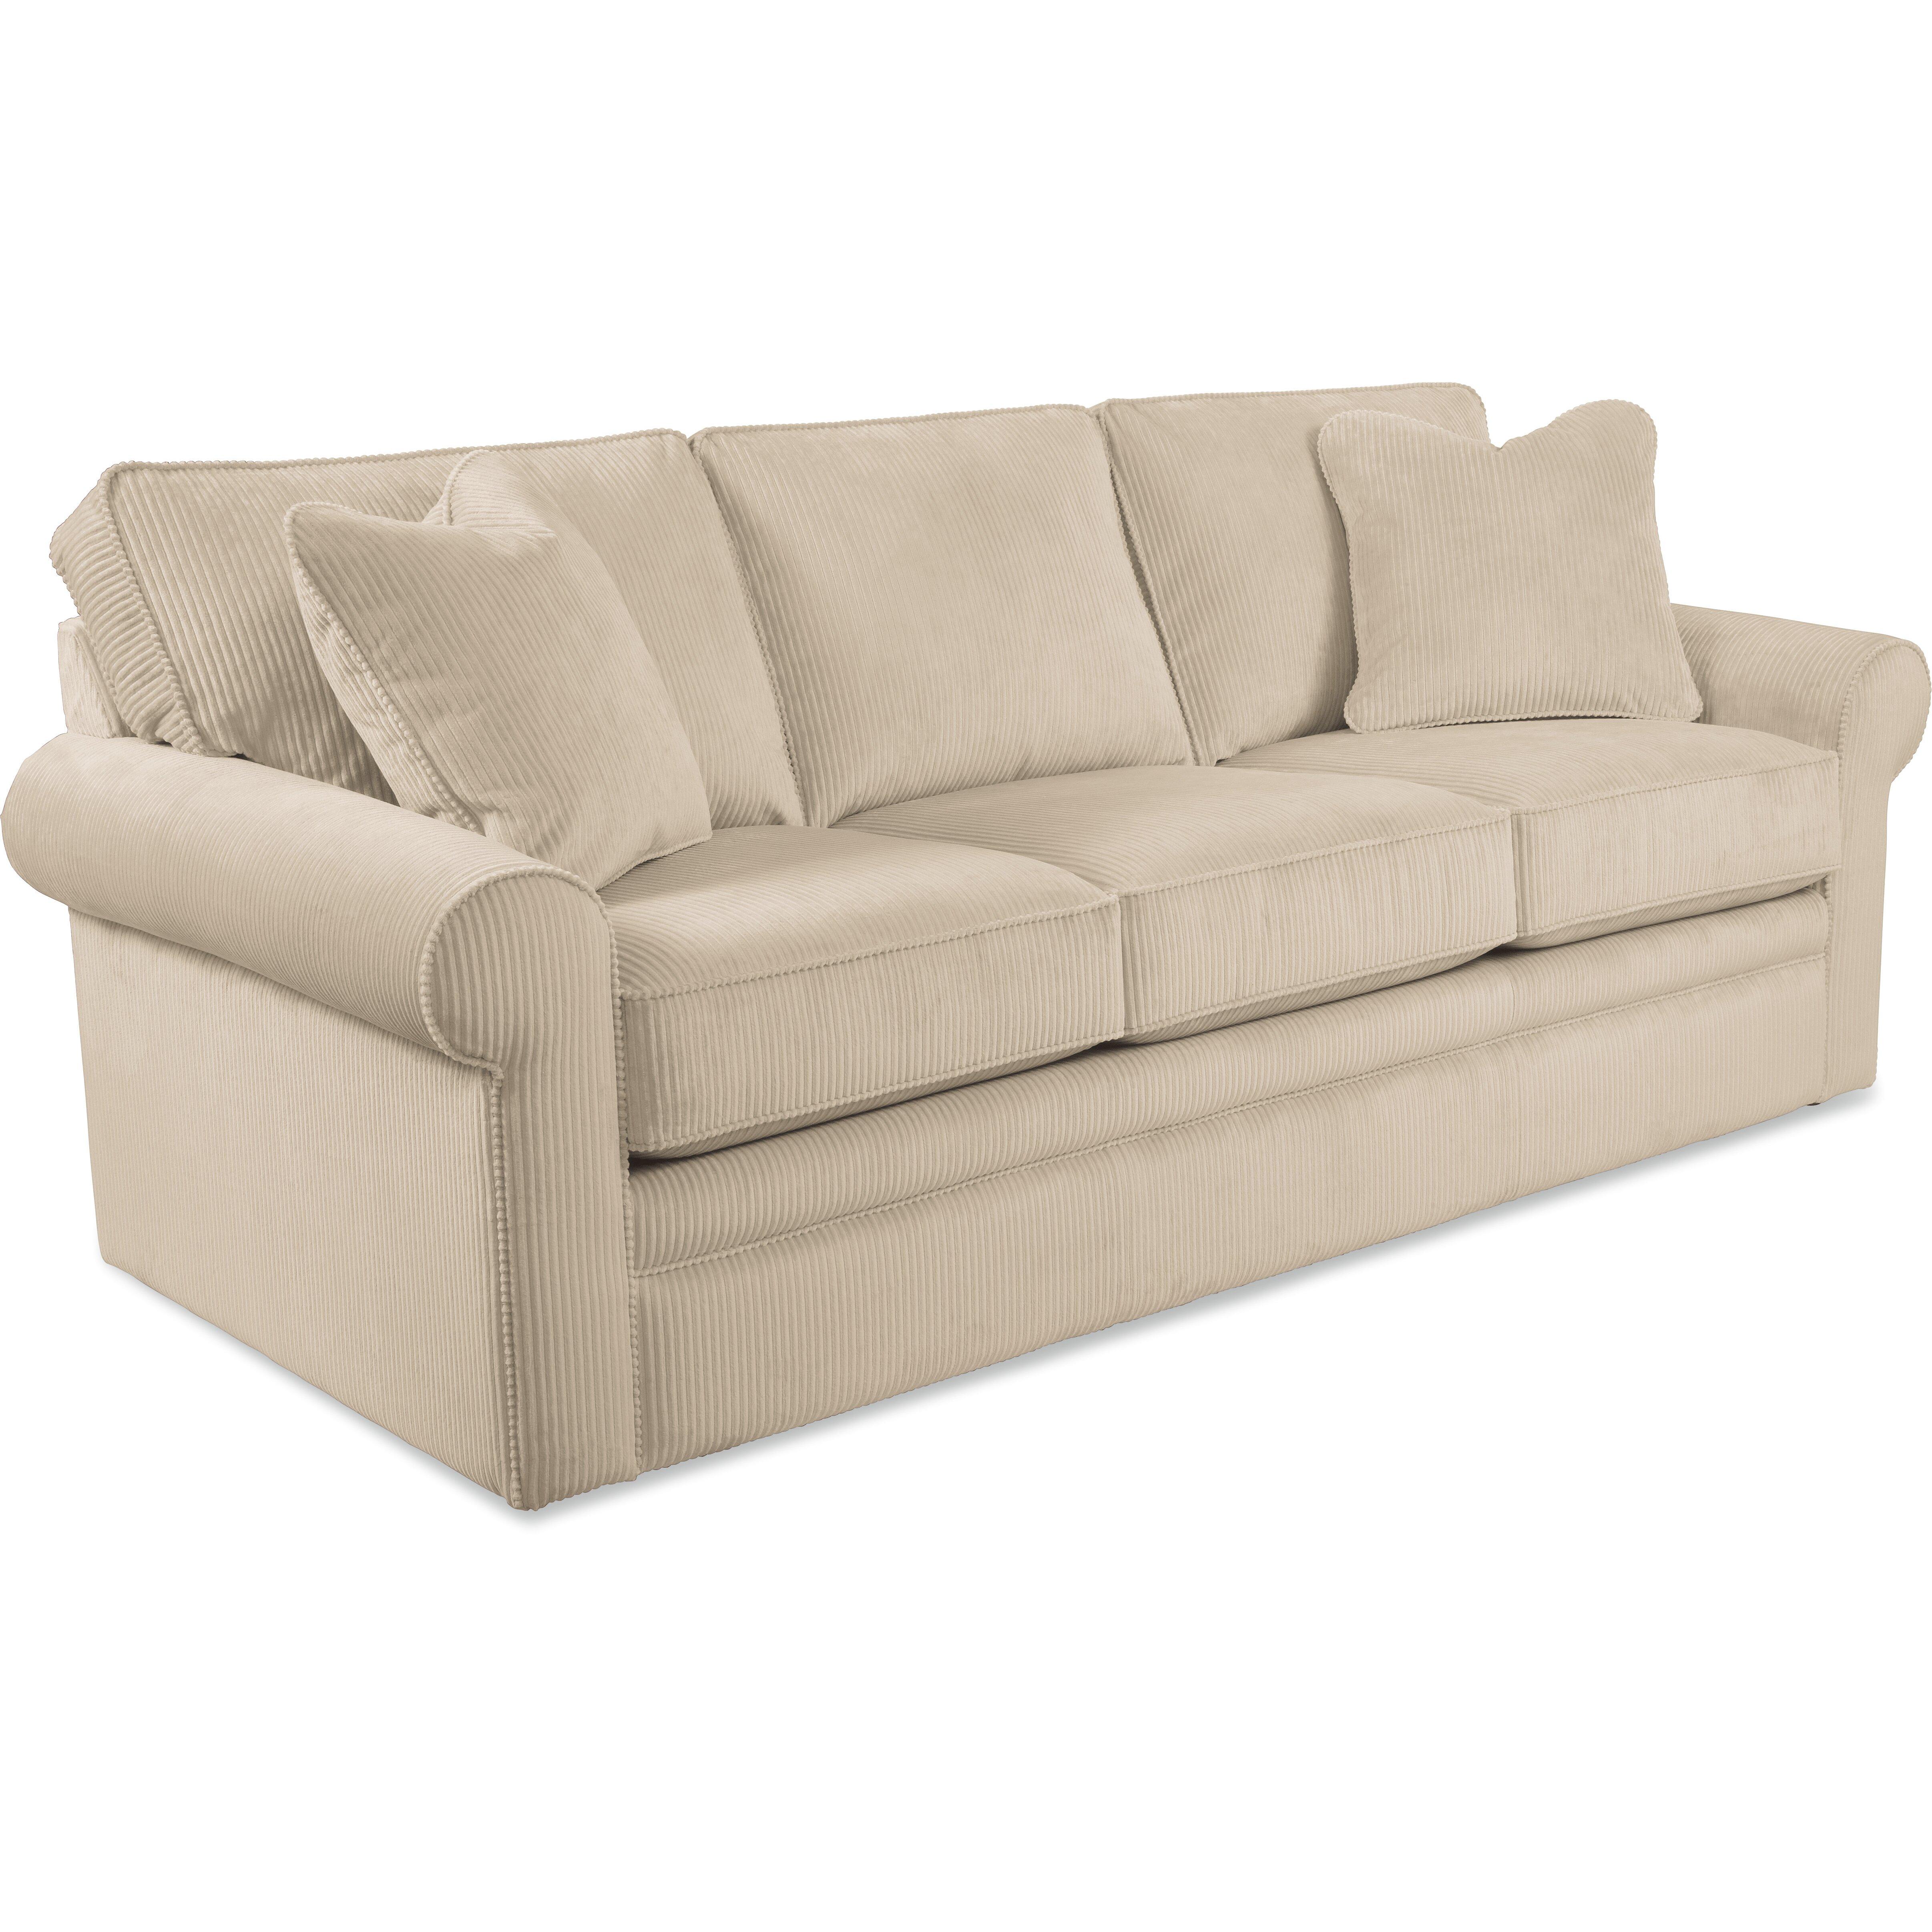 La Z Boy Collins Premier Sofa Reviews Wayfair Supply